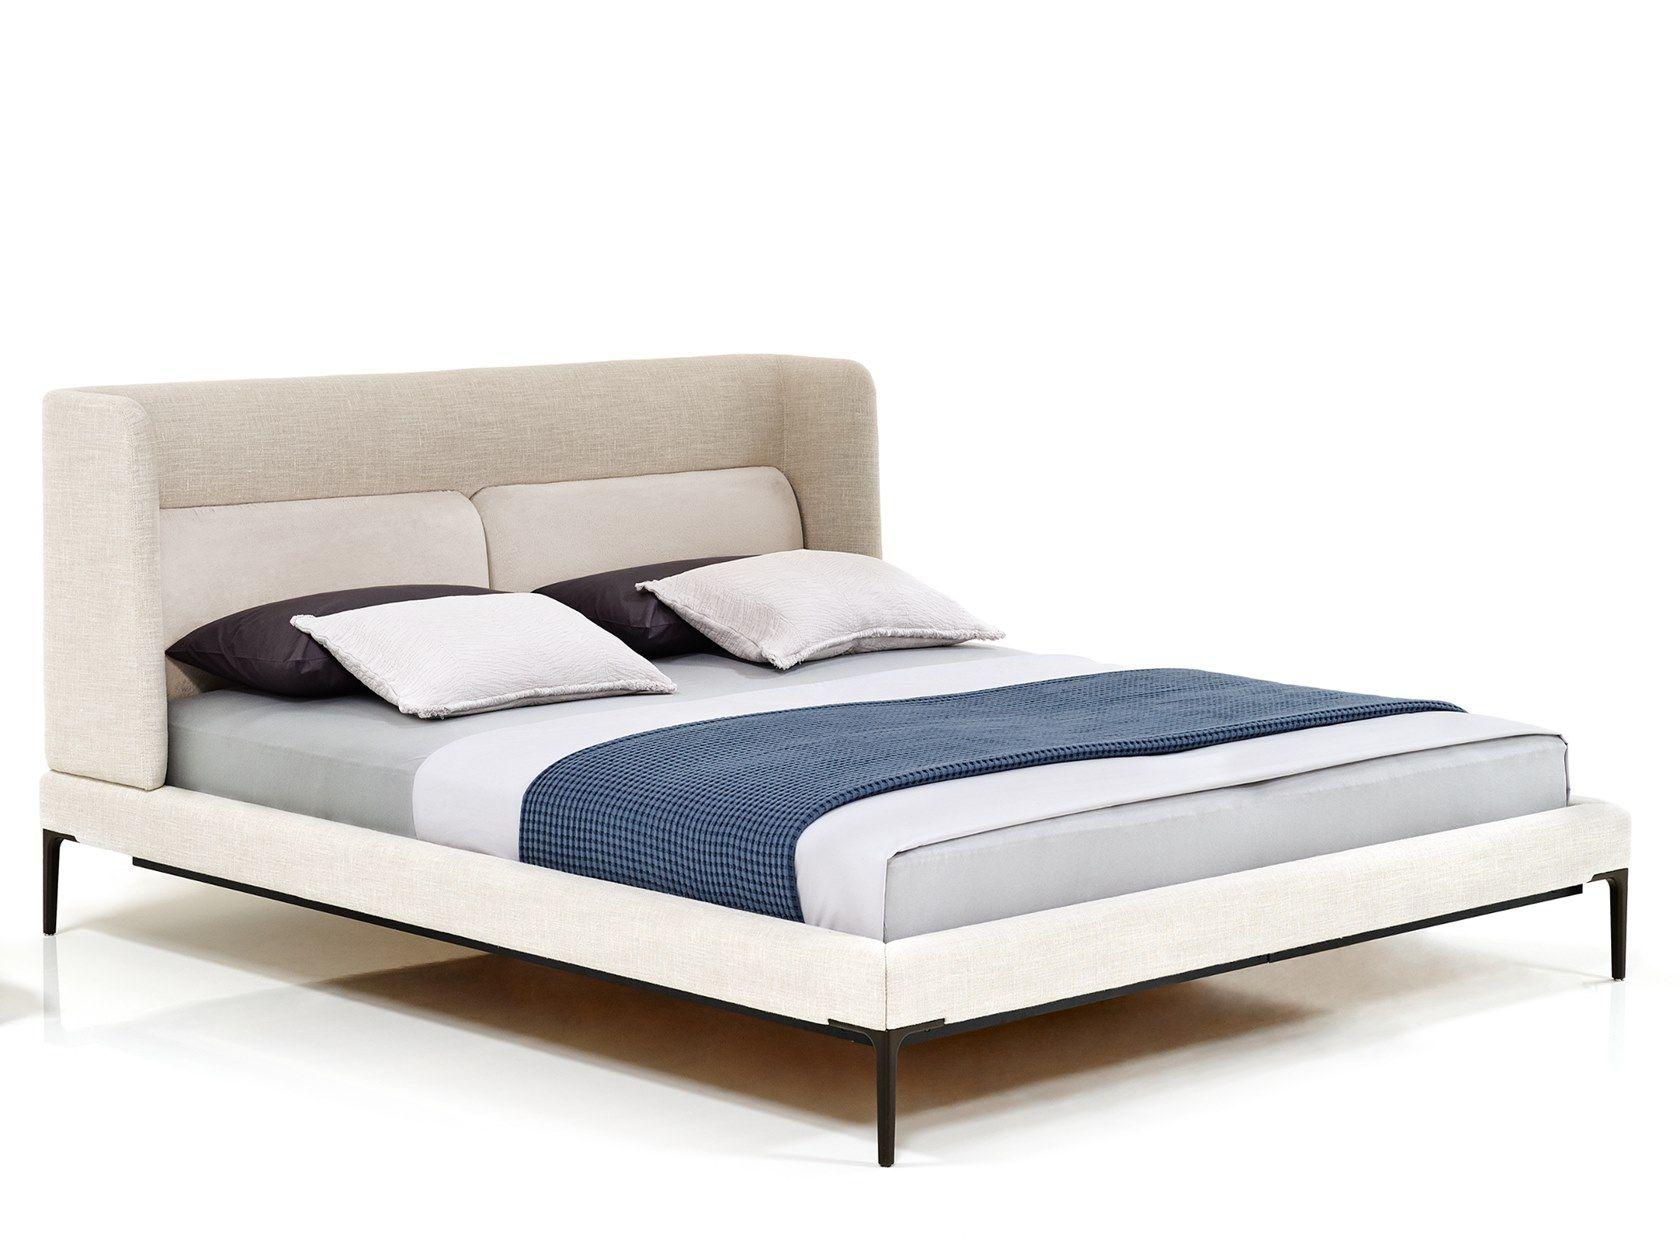 Double bed with high headboard JOYCE NICHE